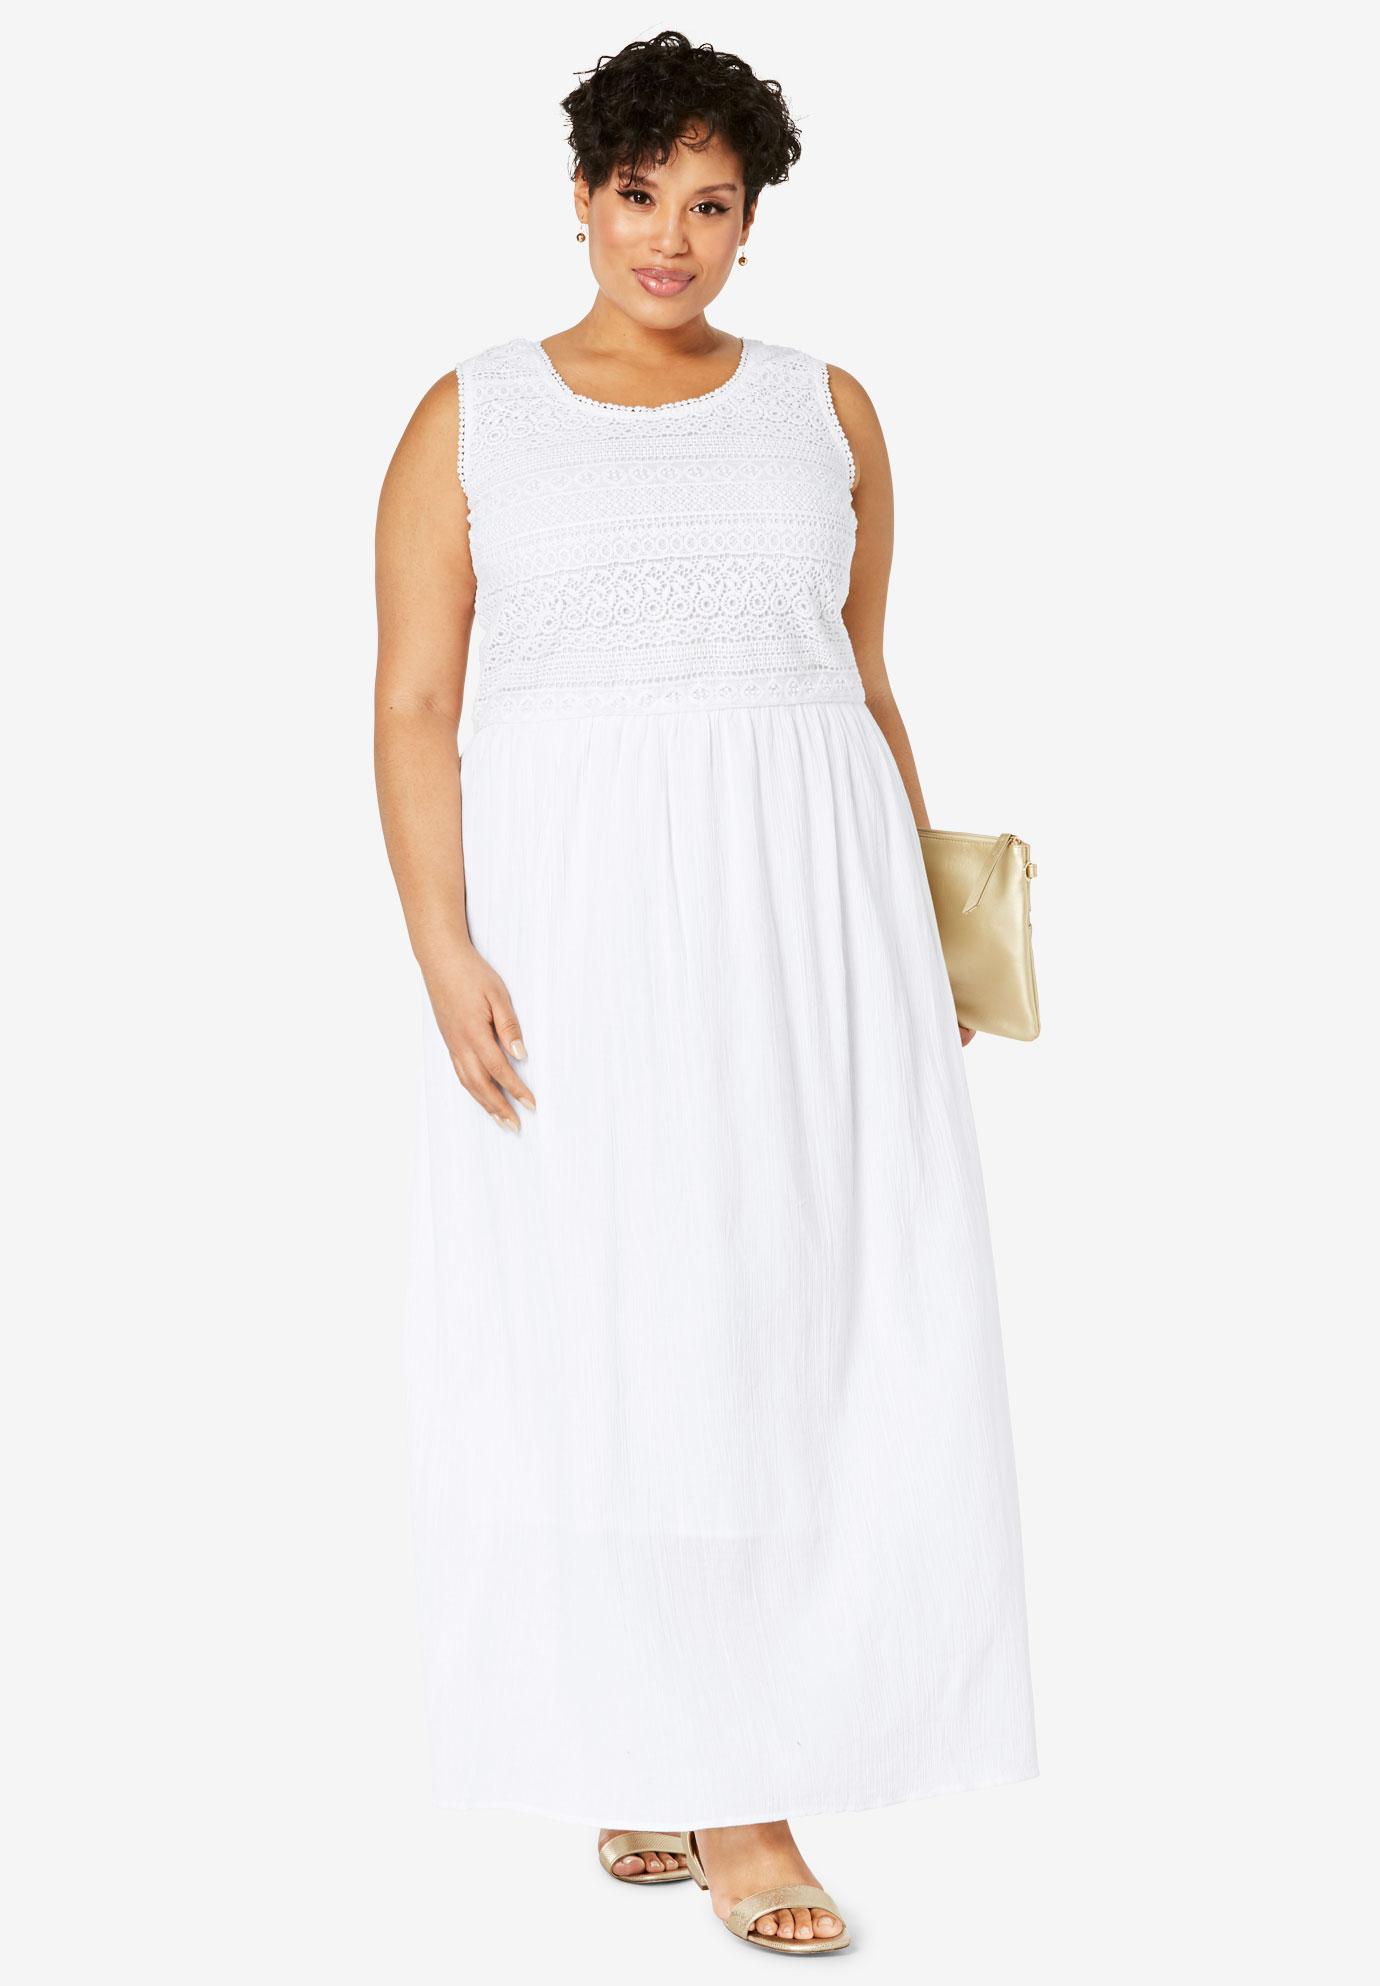 Gauze Maxi Dress | Plus Size Maxi Dresses | Full Beauty